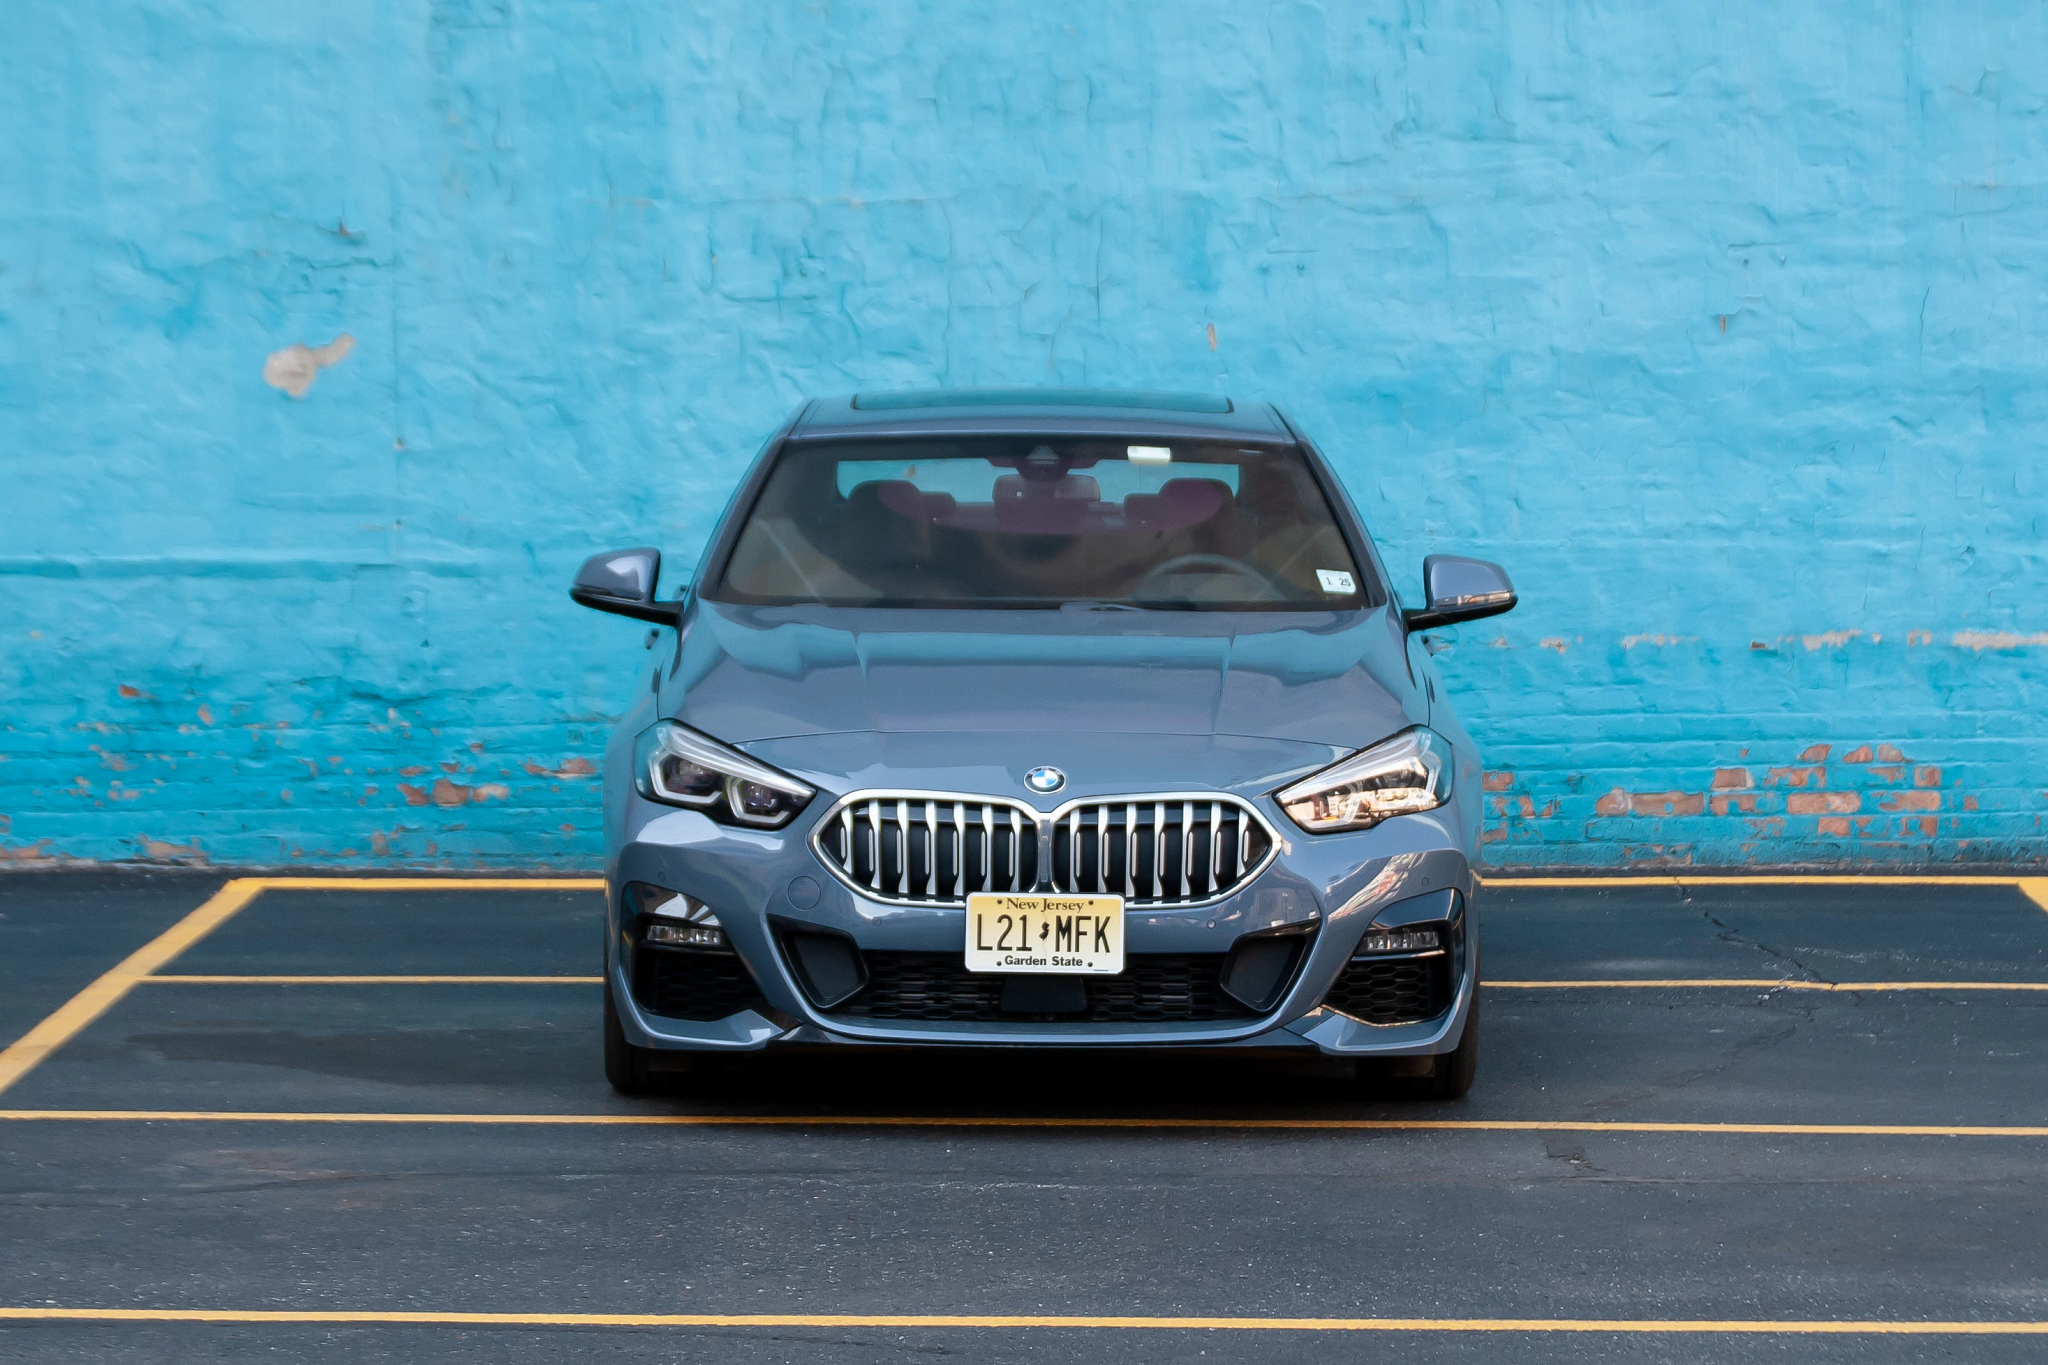 bmw-228i-x-drive-2020-02-blue--exterior--front.jpg